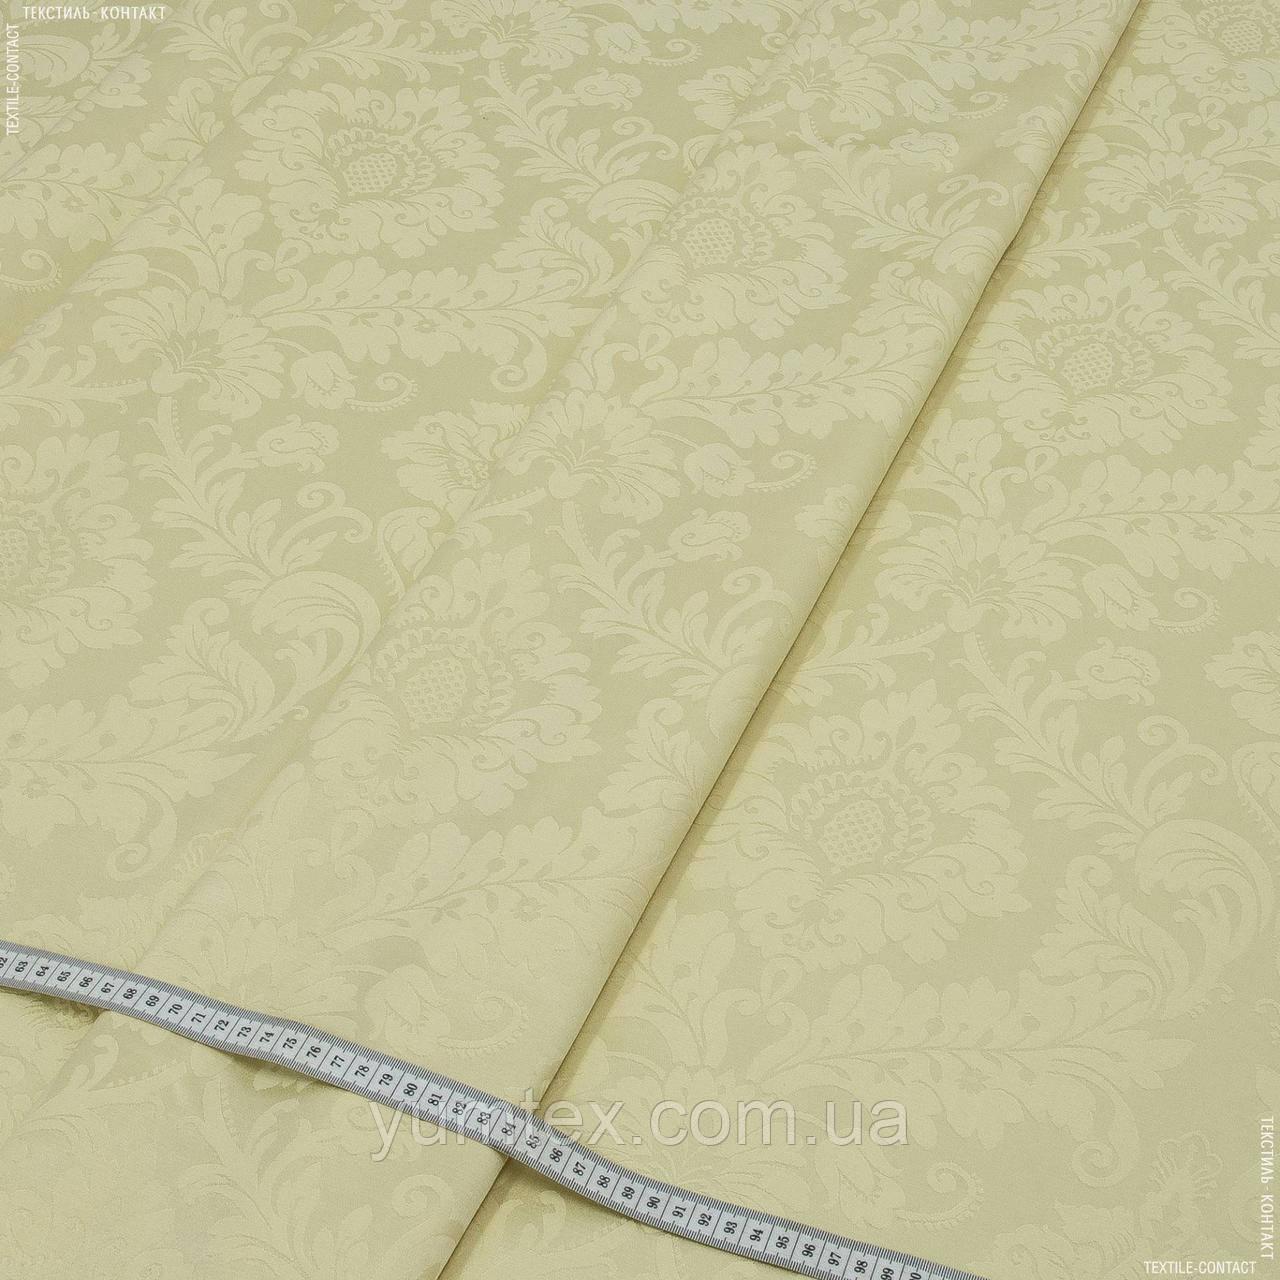 Декоративная ткань  тренто  / trento  134427